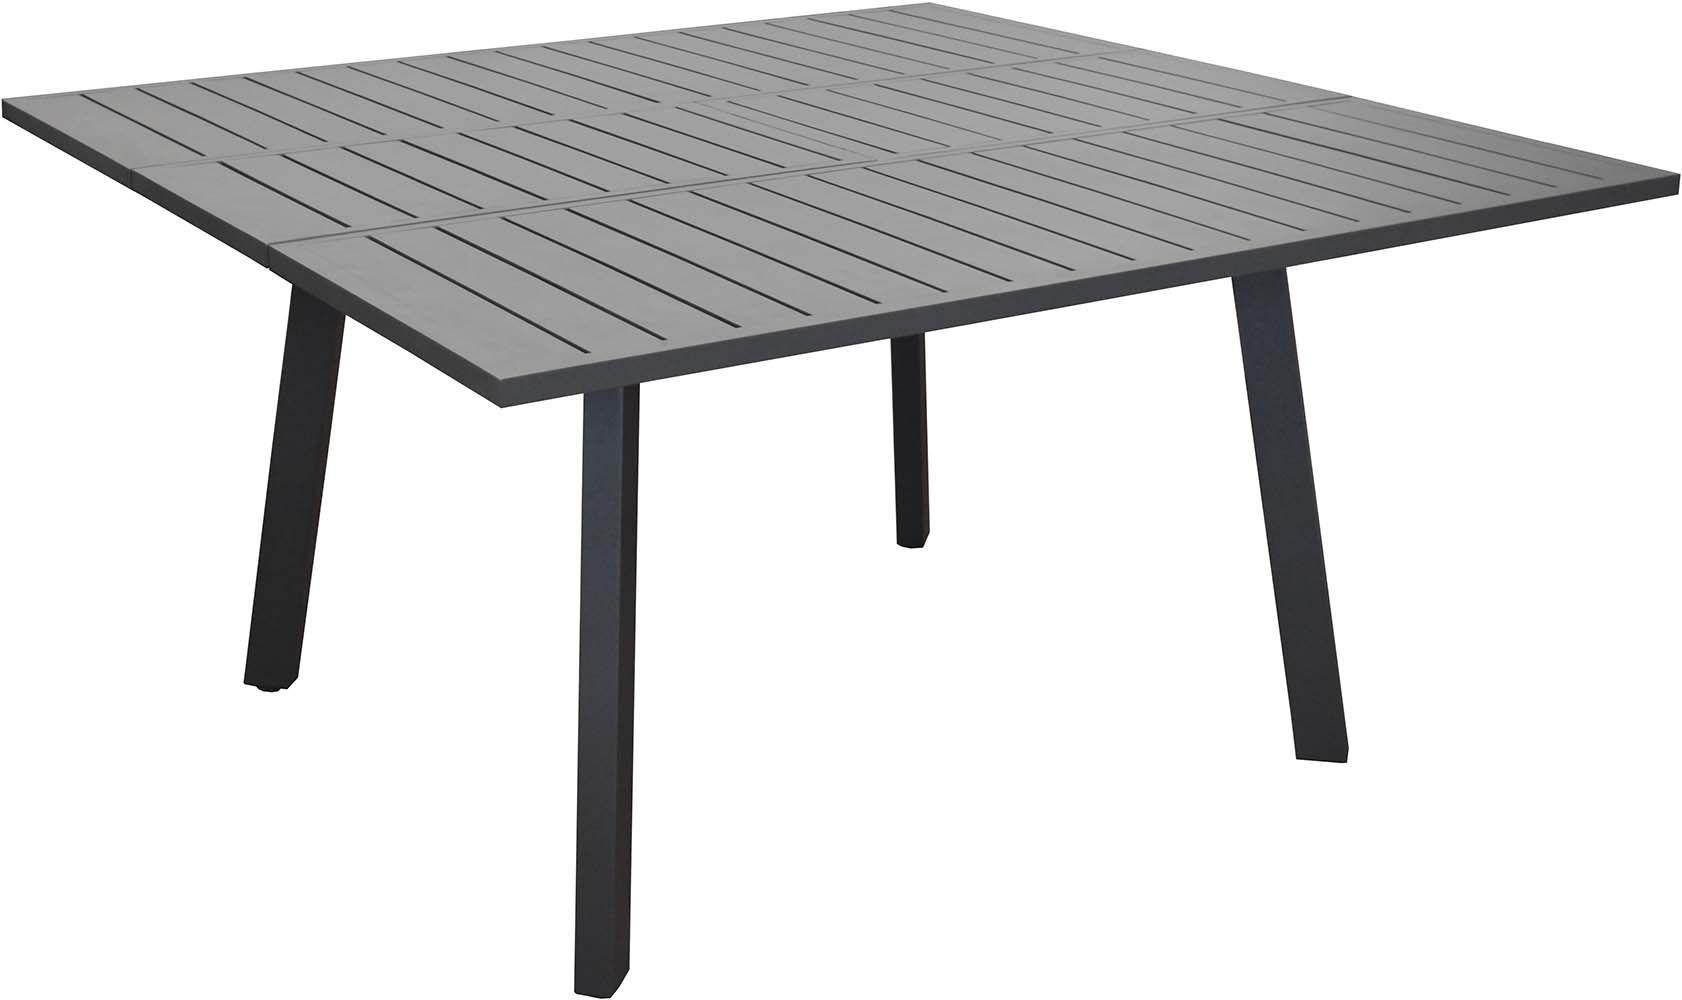 table en aluminium avec allonge barcelona 145 cm gris. Black Bedroom Furniture Sets. Home Design Ideas